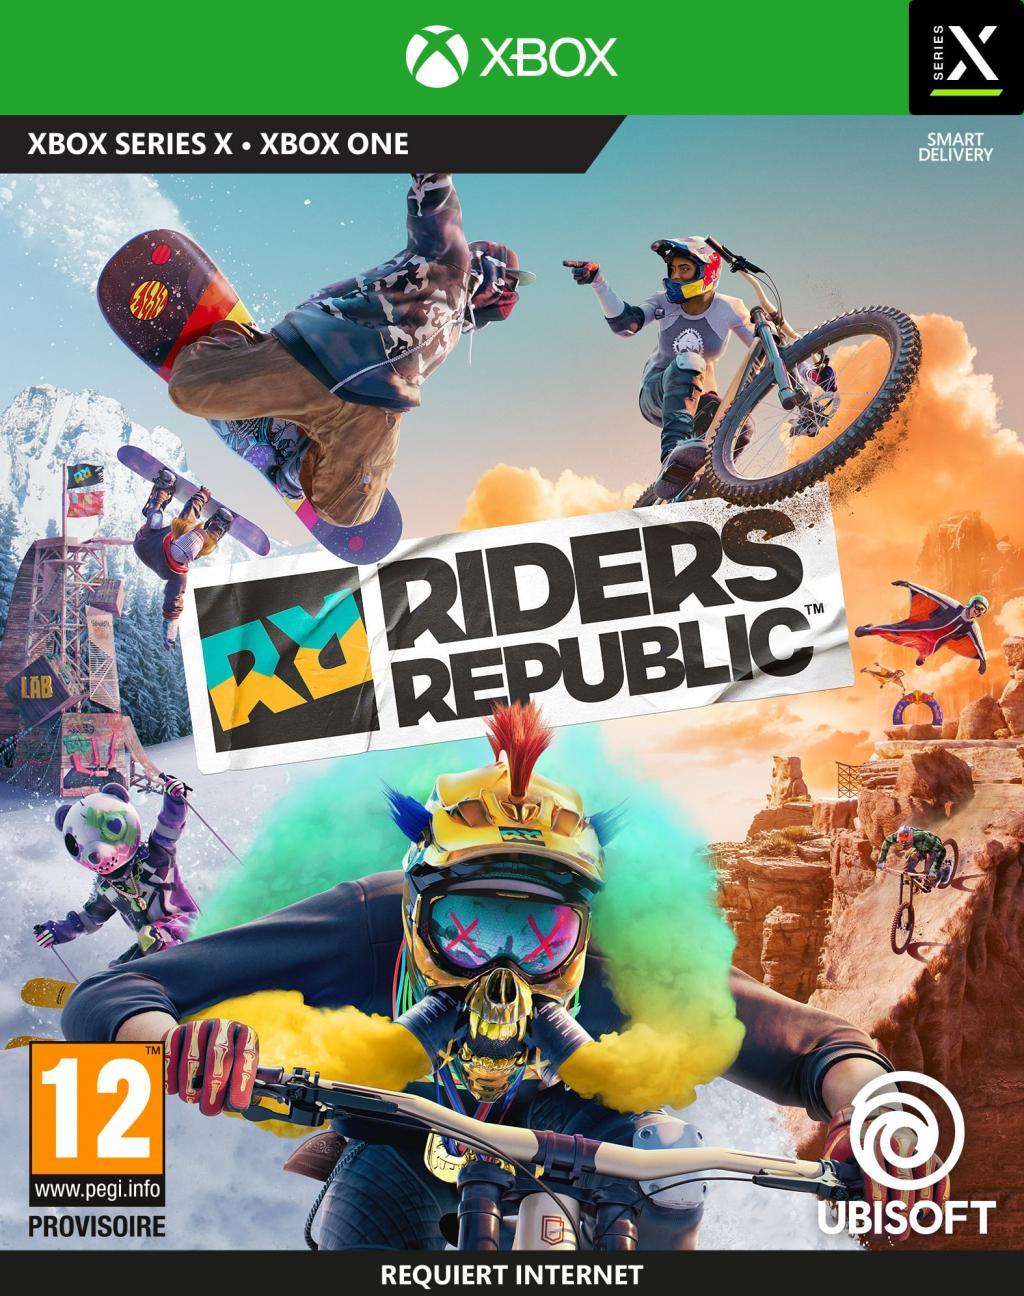 Riders Republic - XB ONE / XB SERIES X_1